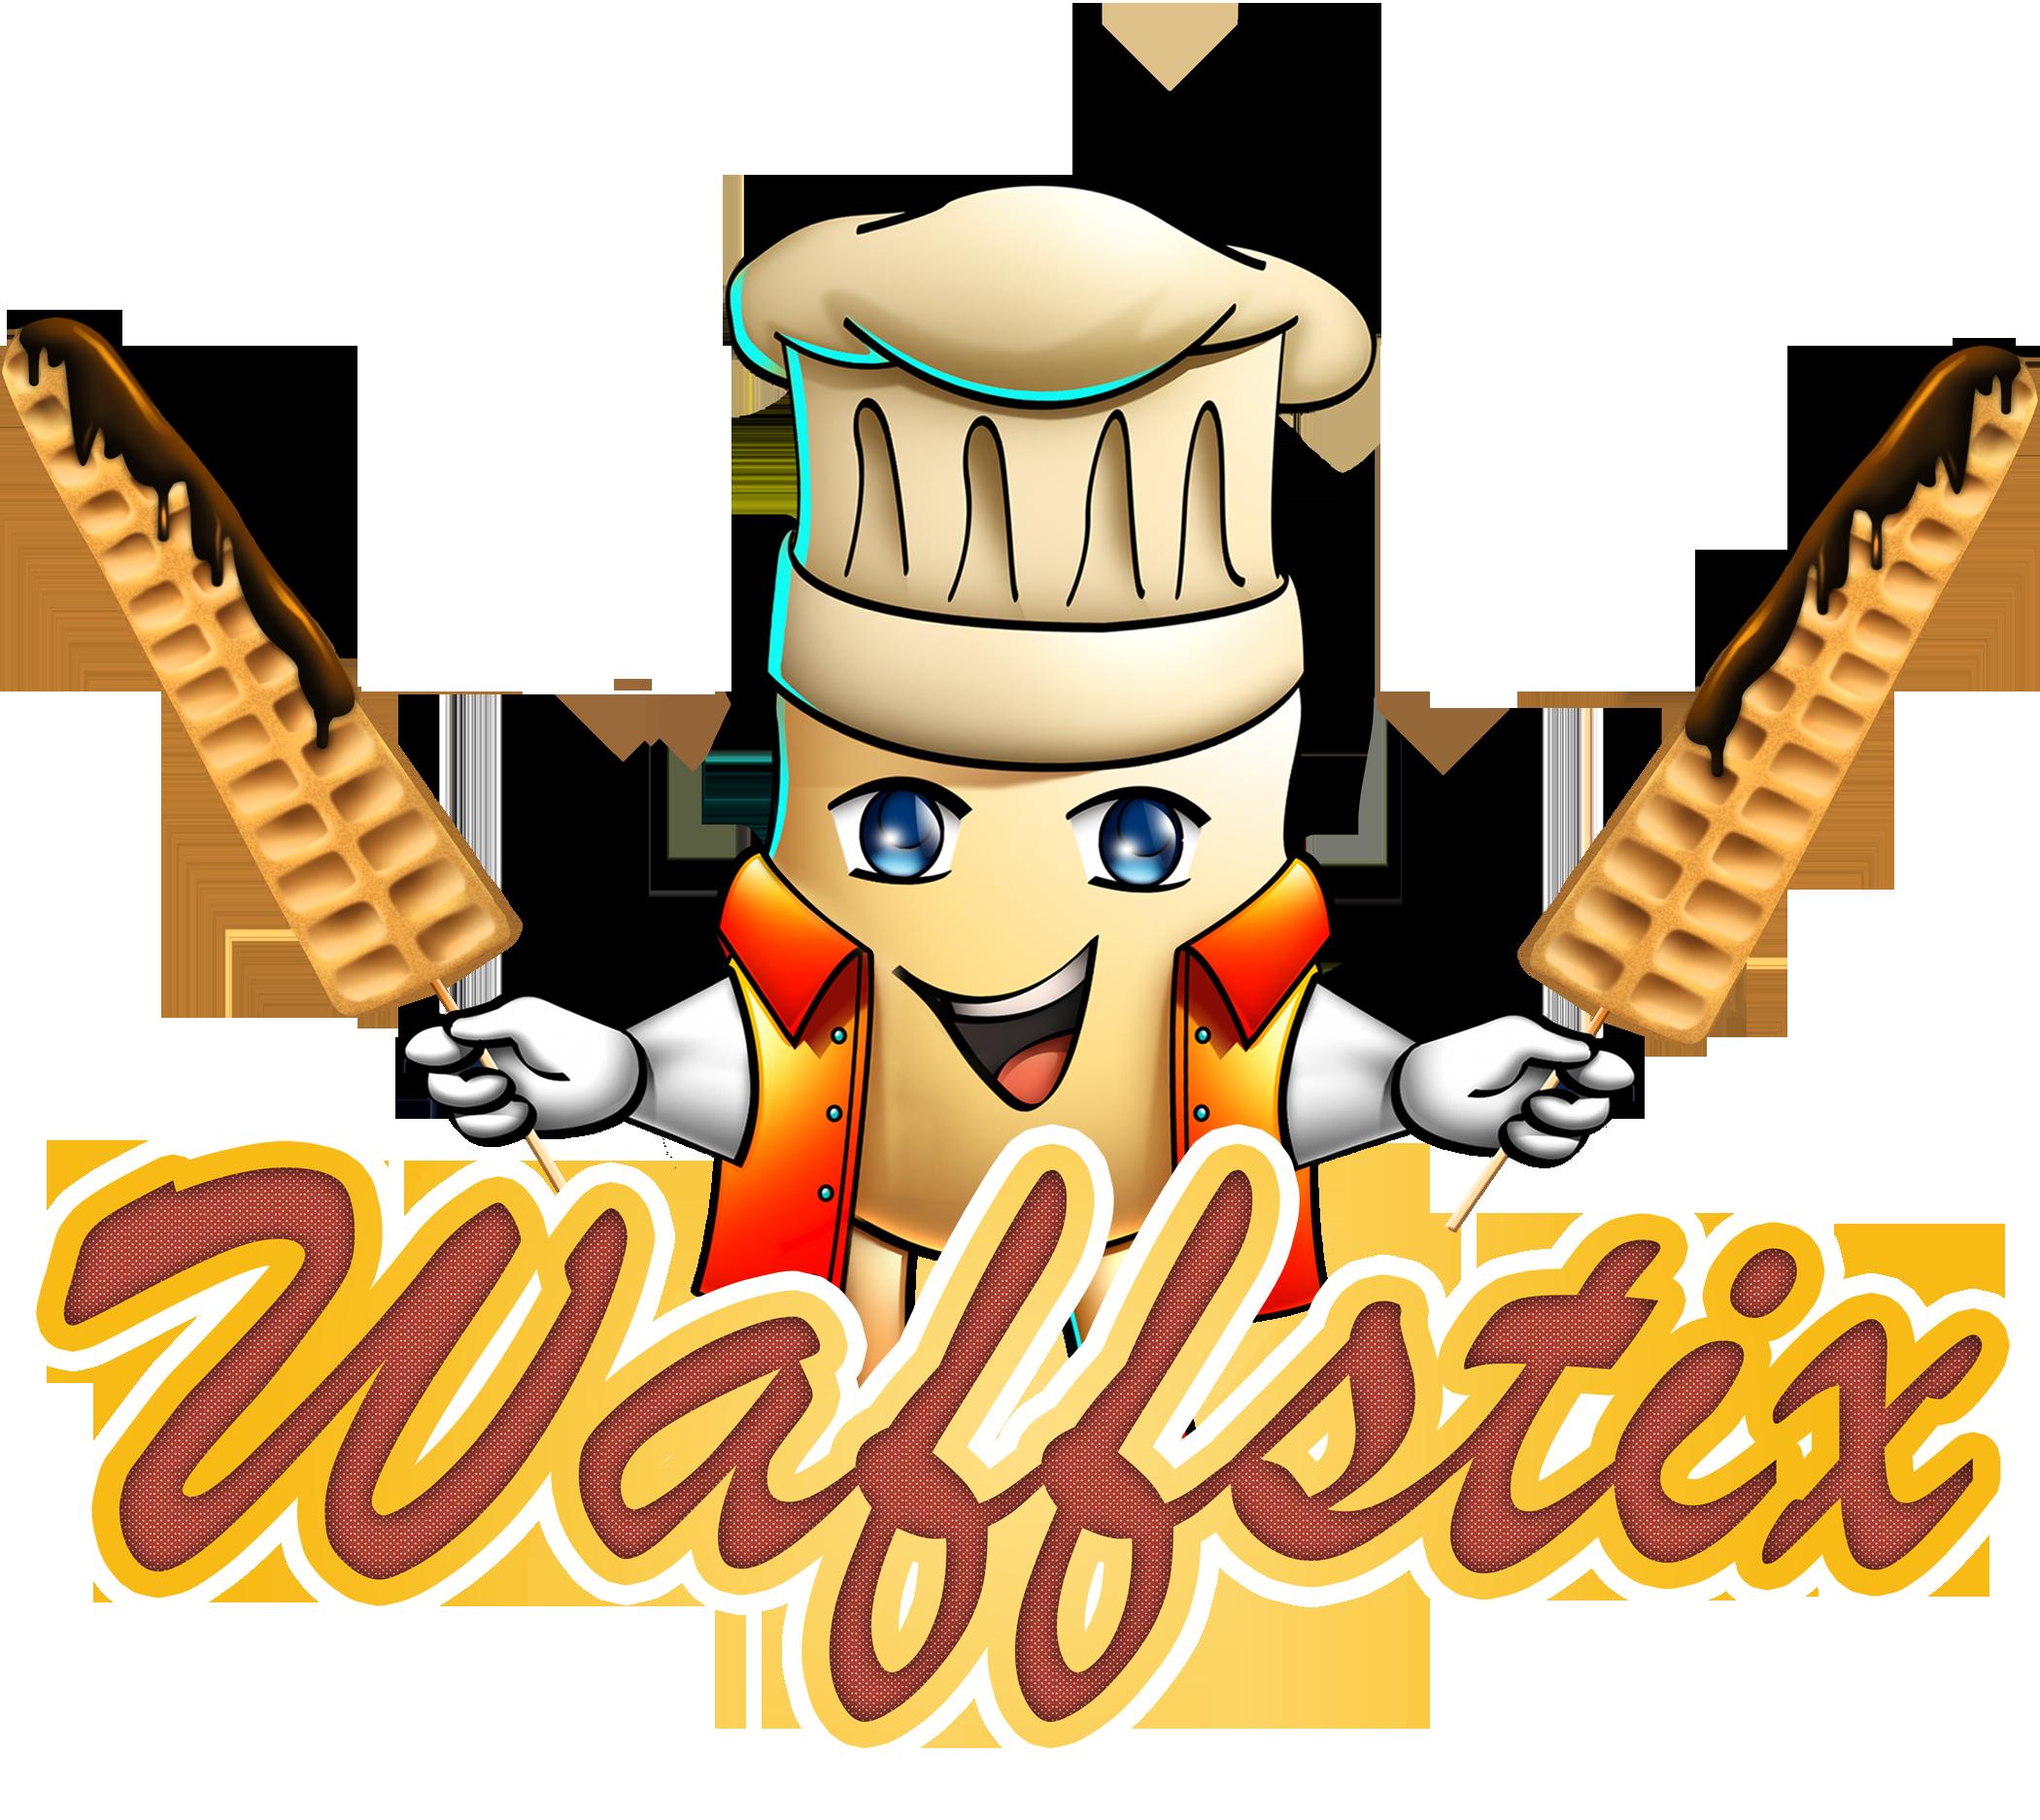 waffstix-logo-w-character1.png